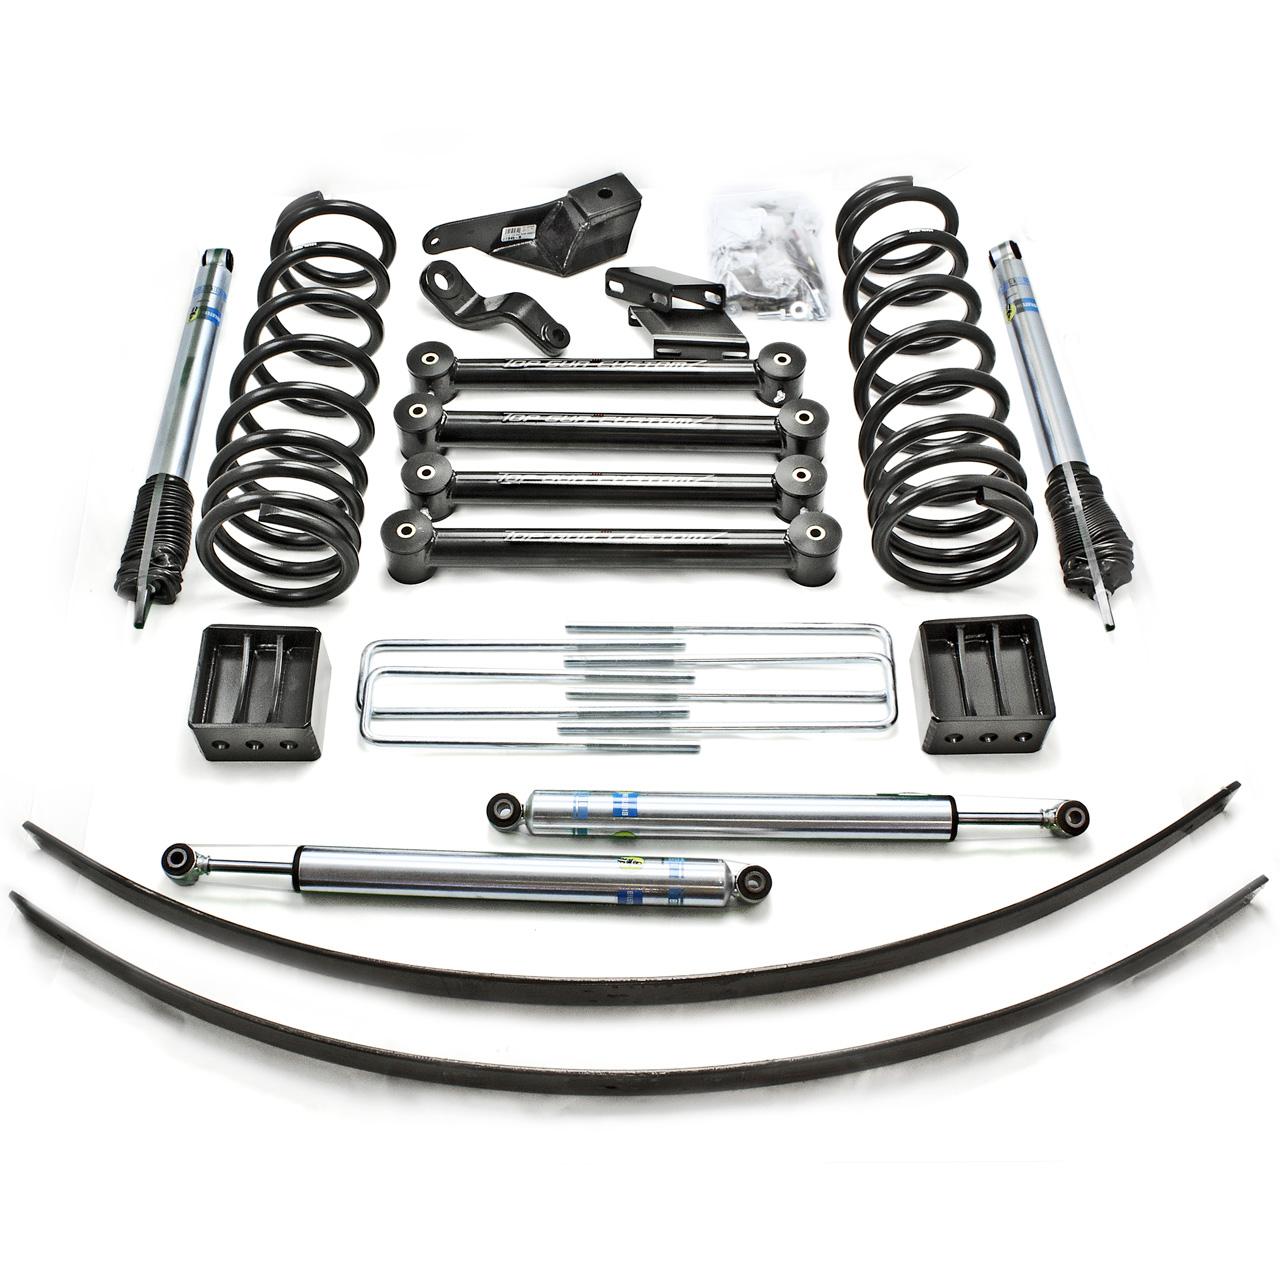 Dodge Lift Kit For 2001 Dodge Ram 2500 Truck Lift Kits